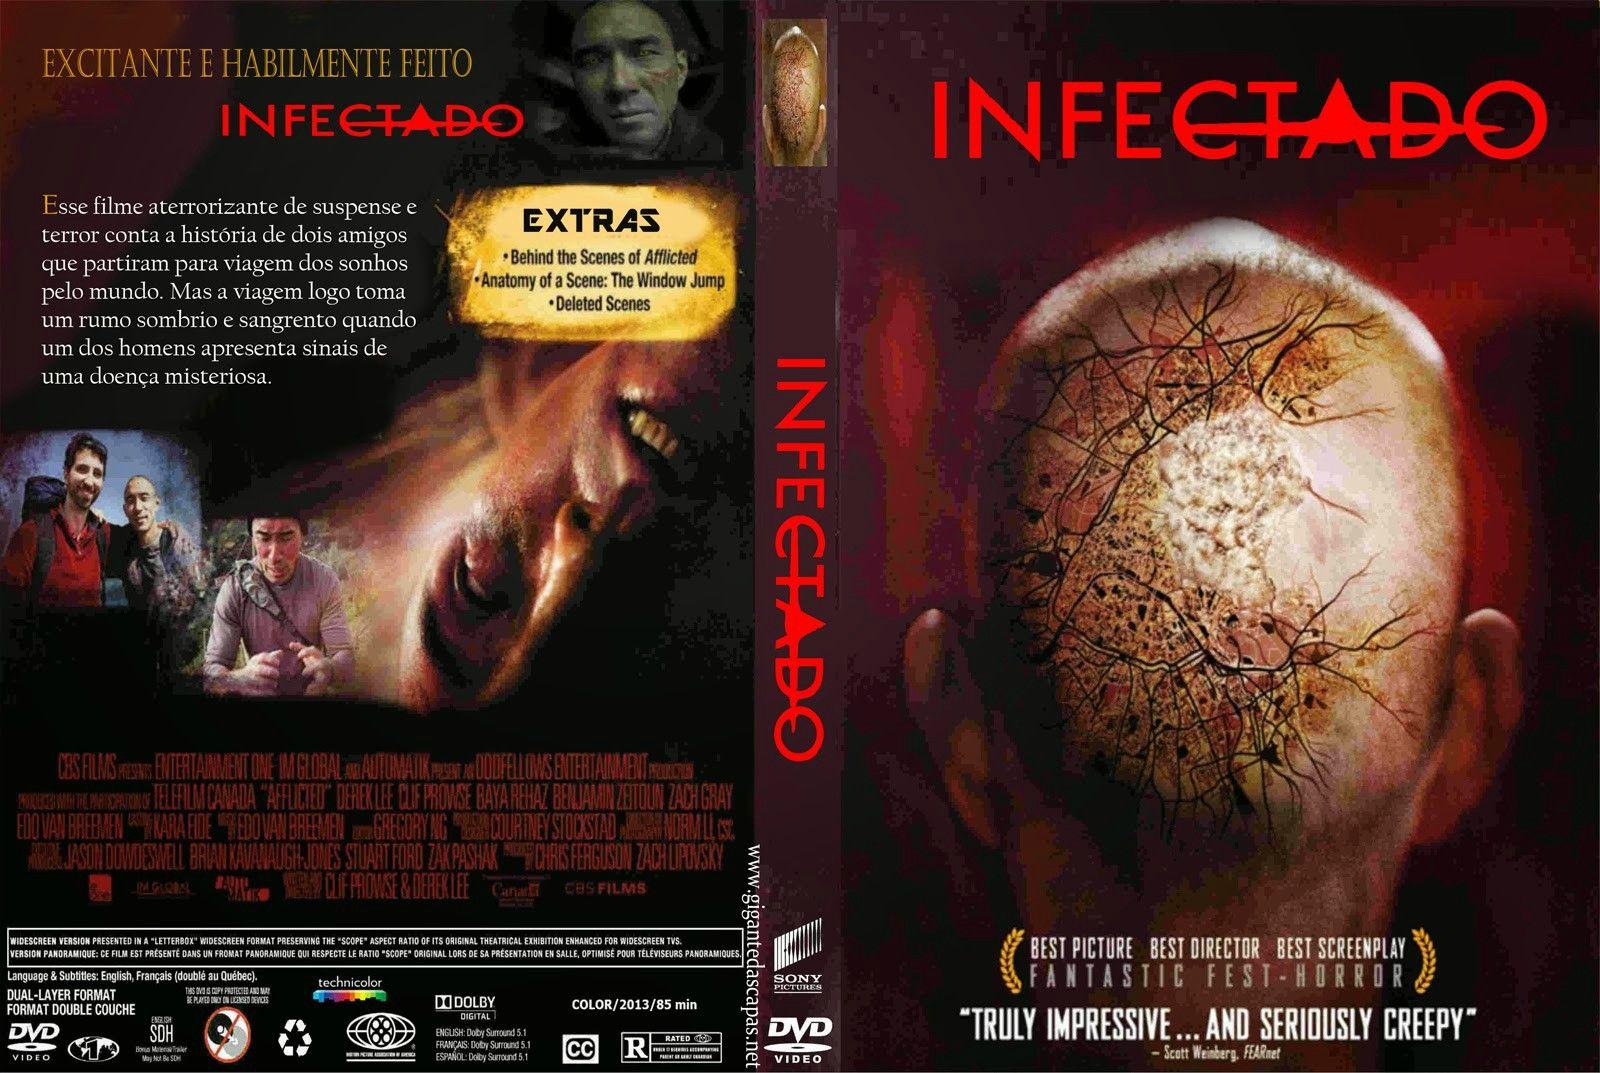 Infectado 2014 Filmes De Terror Filmes Sonhos